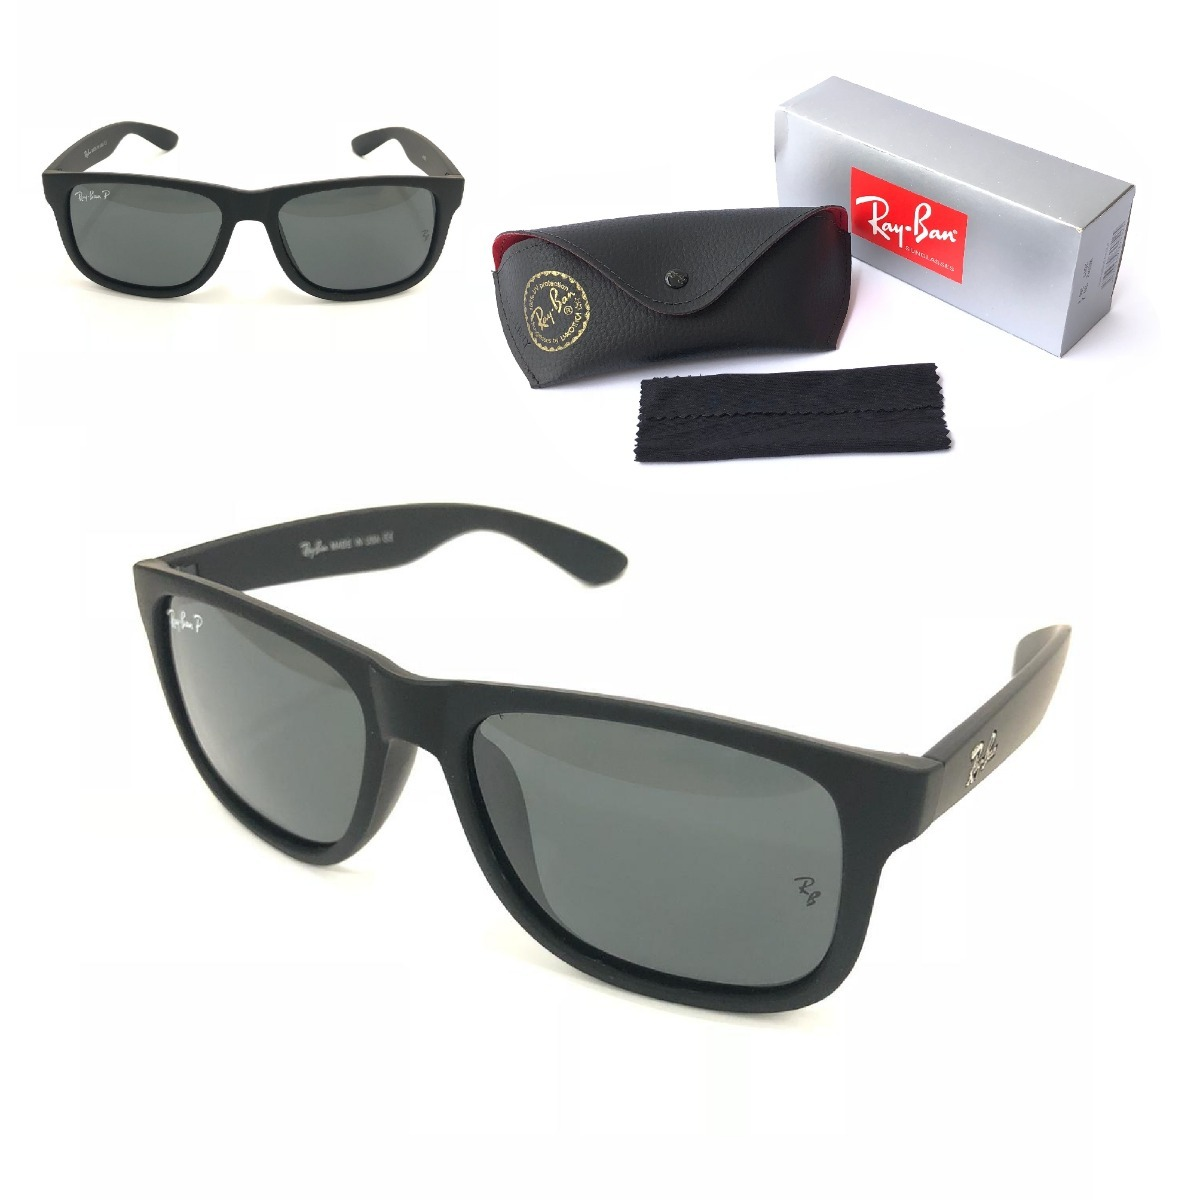 48fb06ca4a0af oculos de sol masculino justin ray ban polarizado rb4165 top. Carregando  zoom.